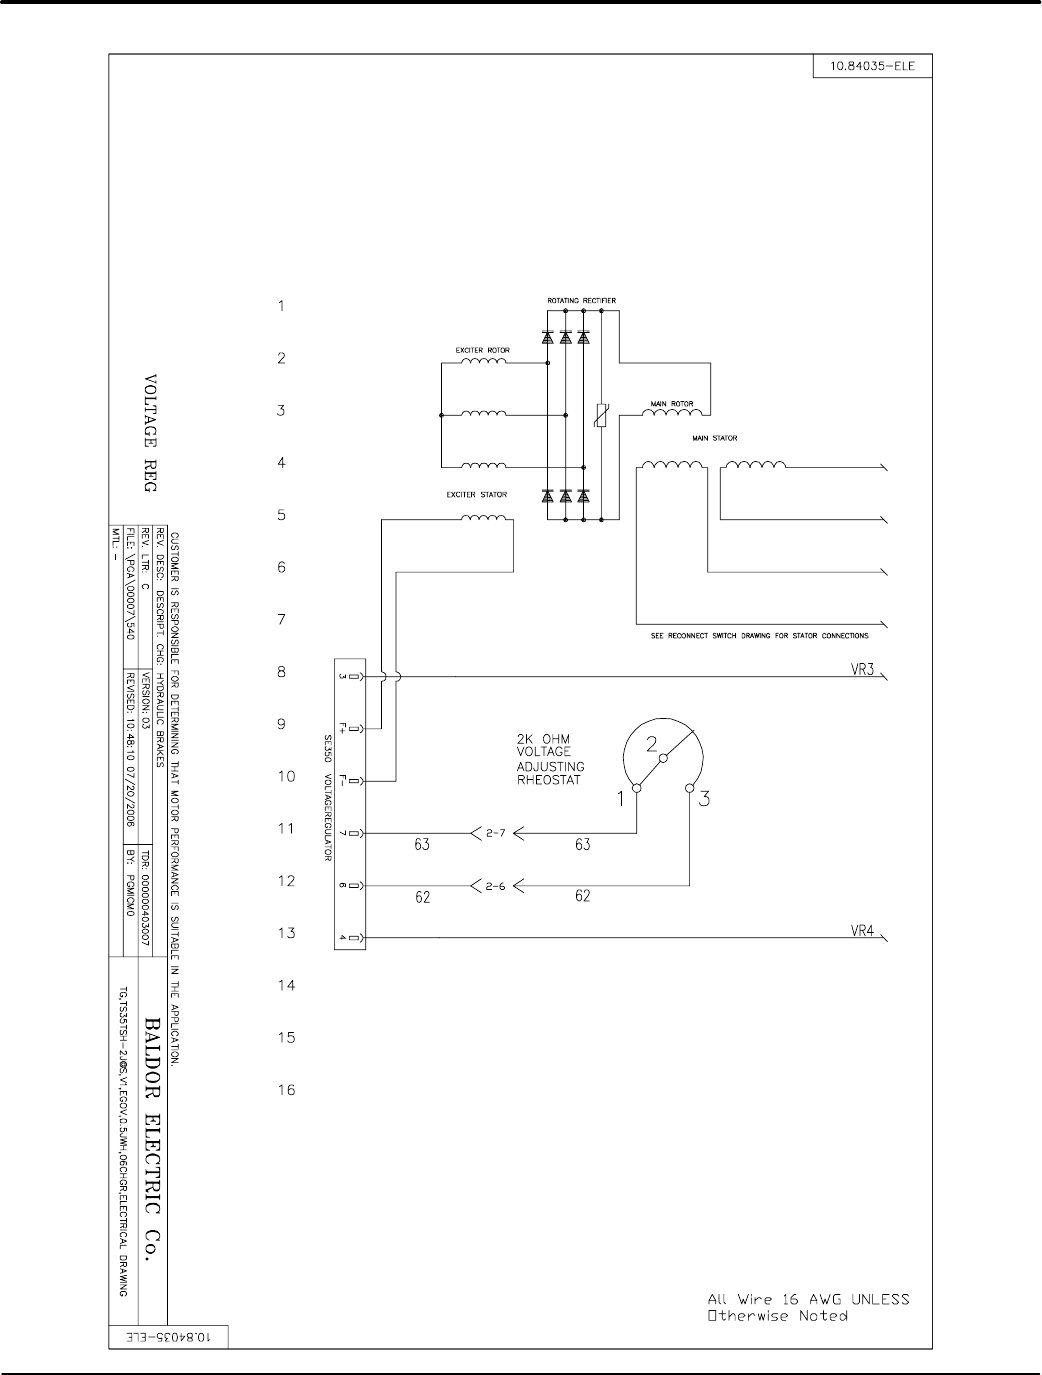 baldor ts35 mn2417 tier 2/3 towable generators user manual to the ... baldor high efficiency wiring diagram  usermanual.wiki